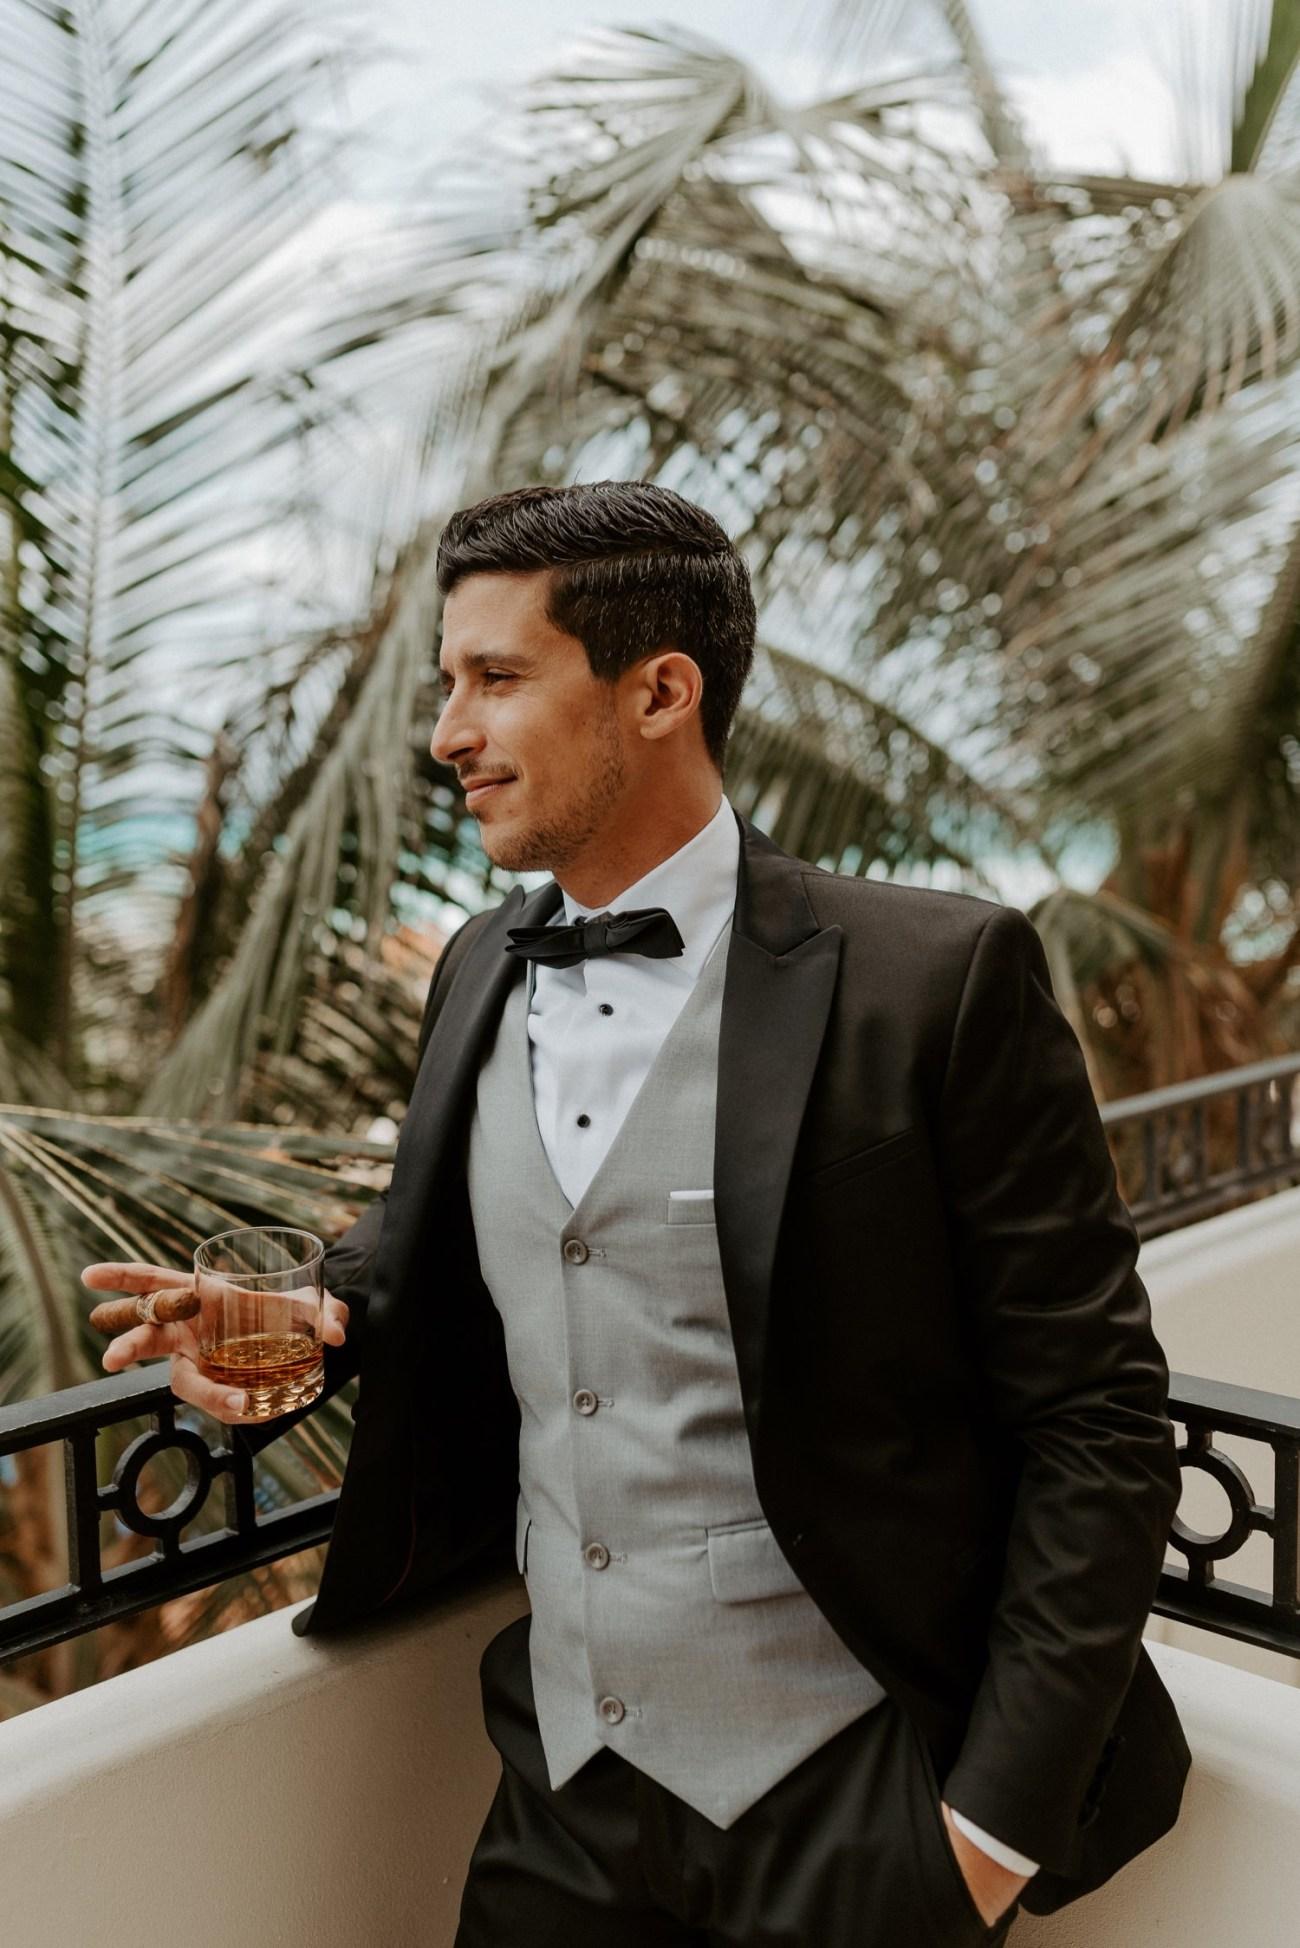 Cancun Destination Wedding Mexico Tulum Wedding Photographer Anais Possamai Photography 009